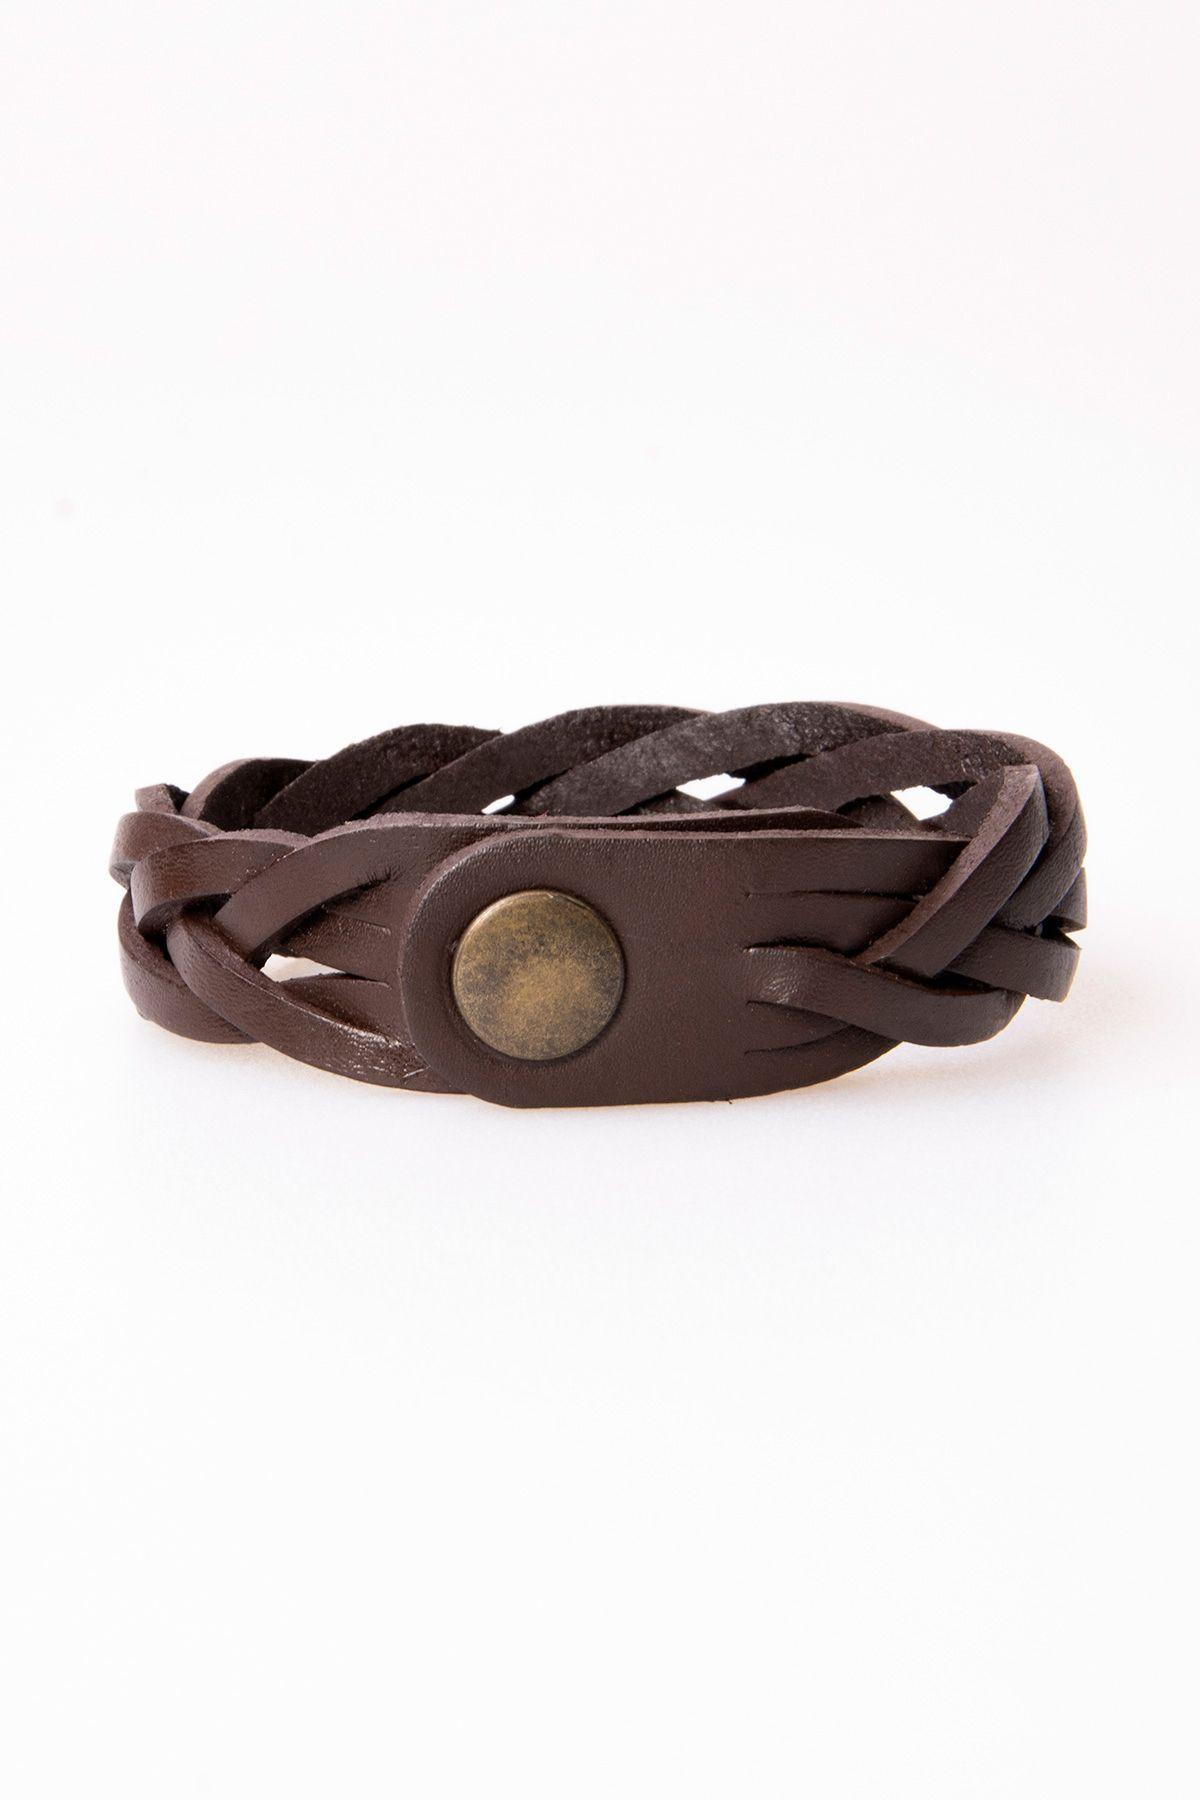 Pegia Genuine Leather Bracelet 19BL27 Brown